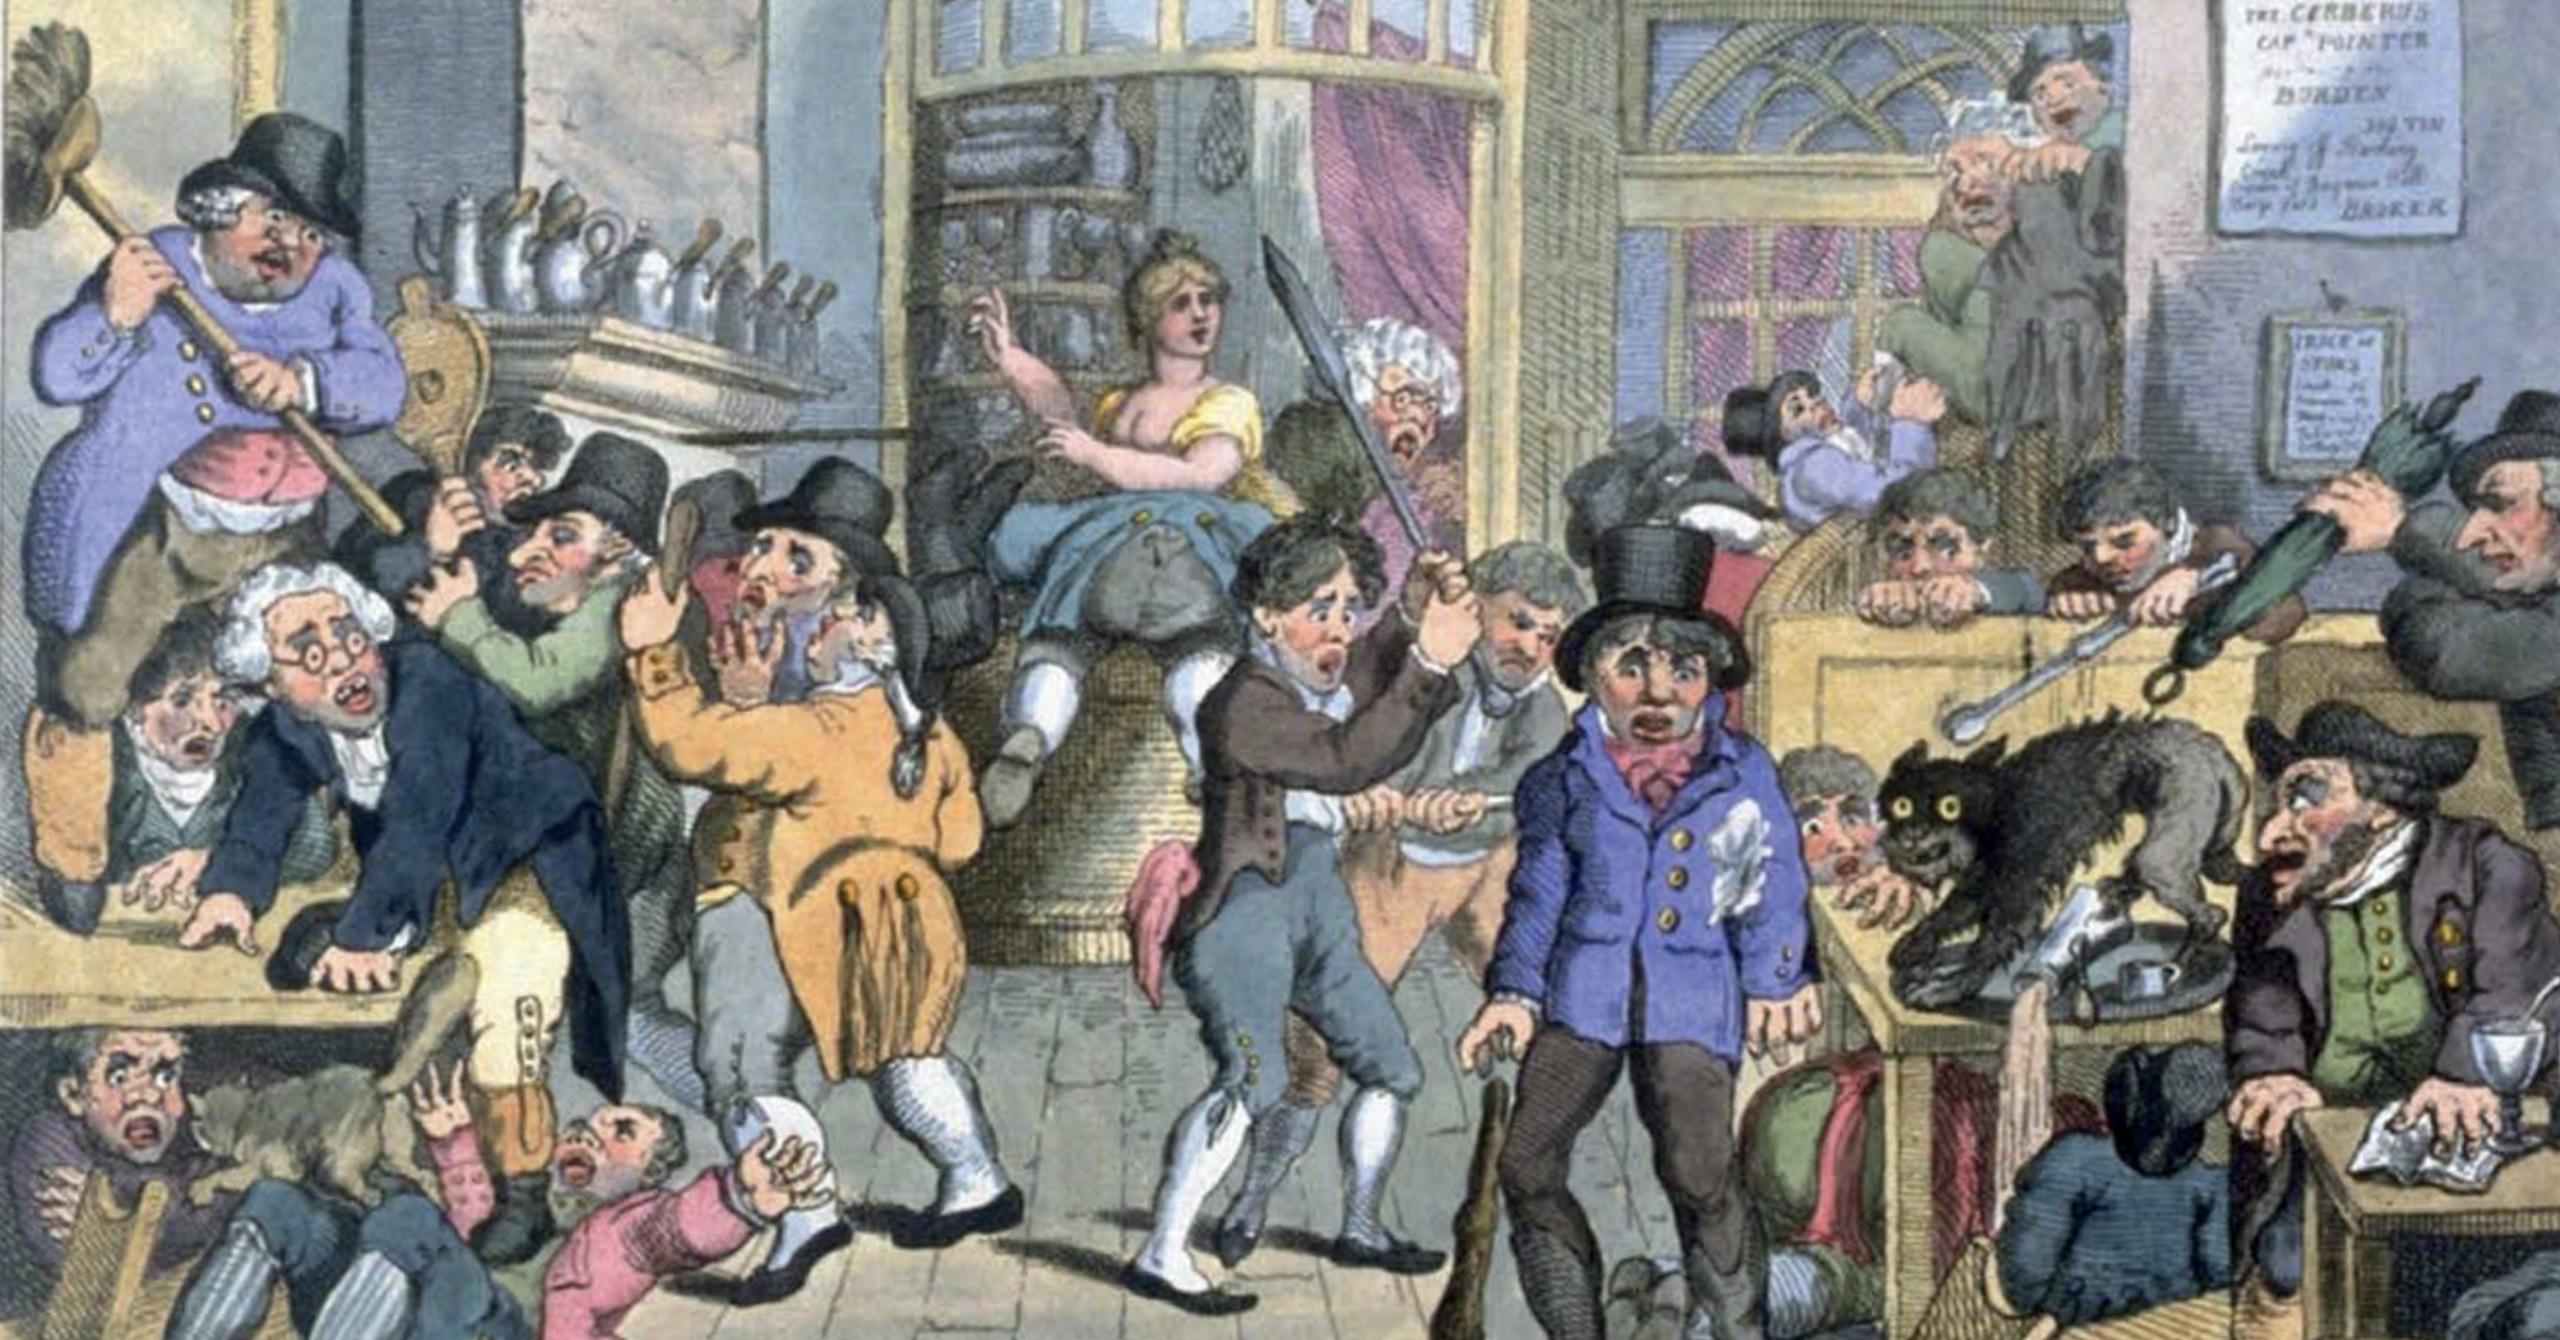 colloque 'Unsocial sociability' and socio-cultural tensions in Enlightenment Britain